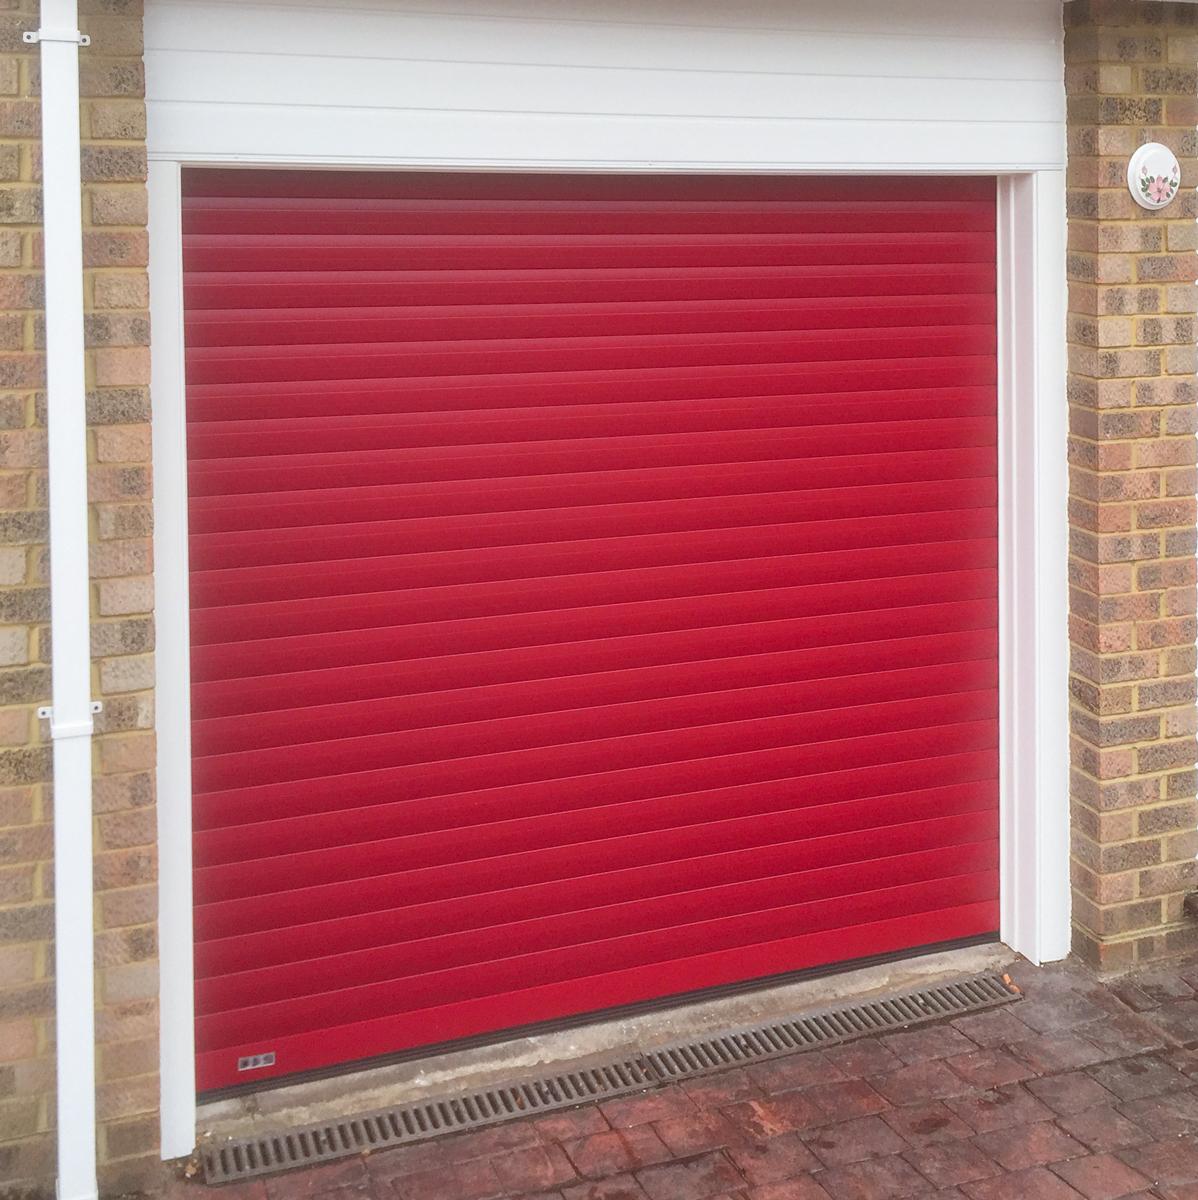 Seceuroglide Roller Garage Door in Ruby Red